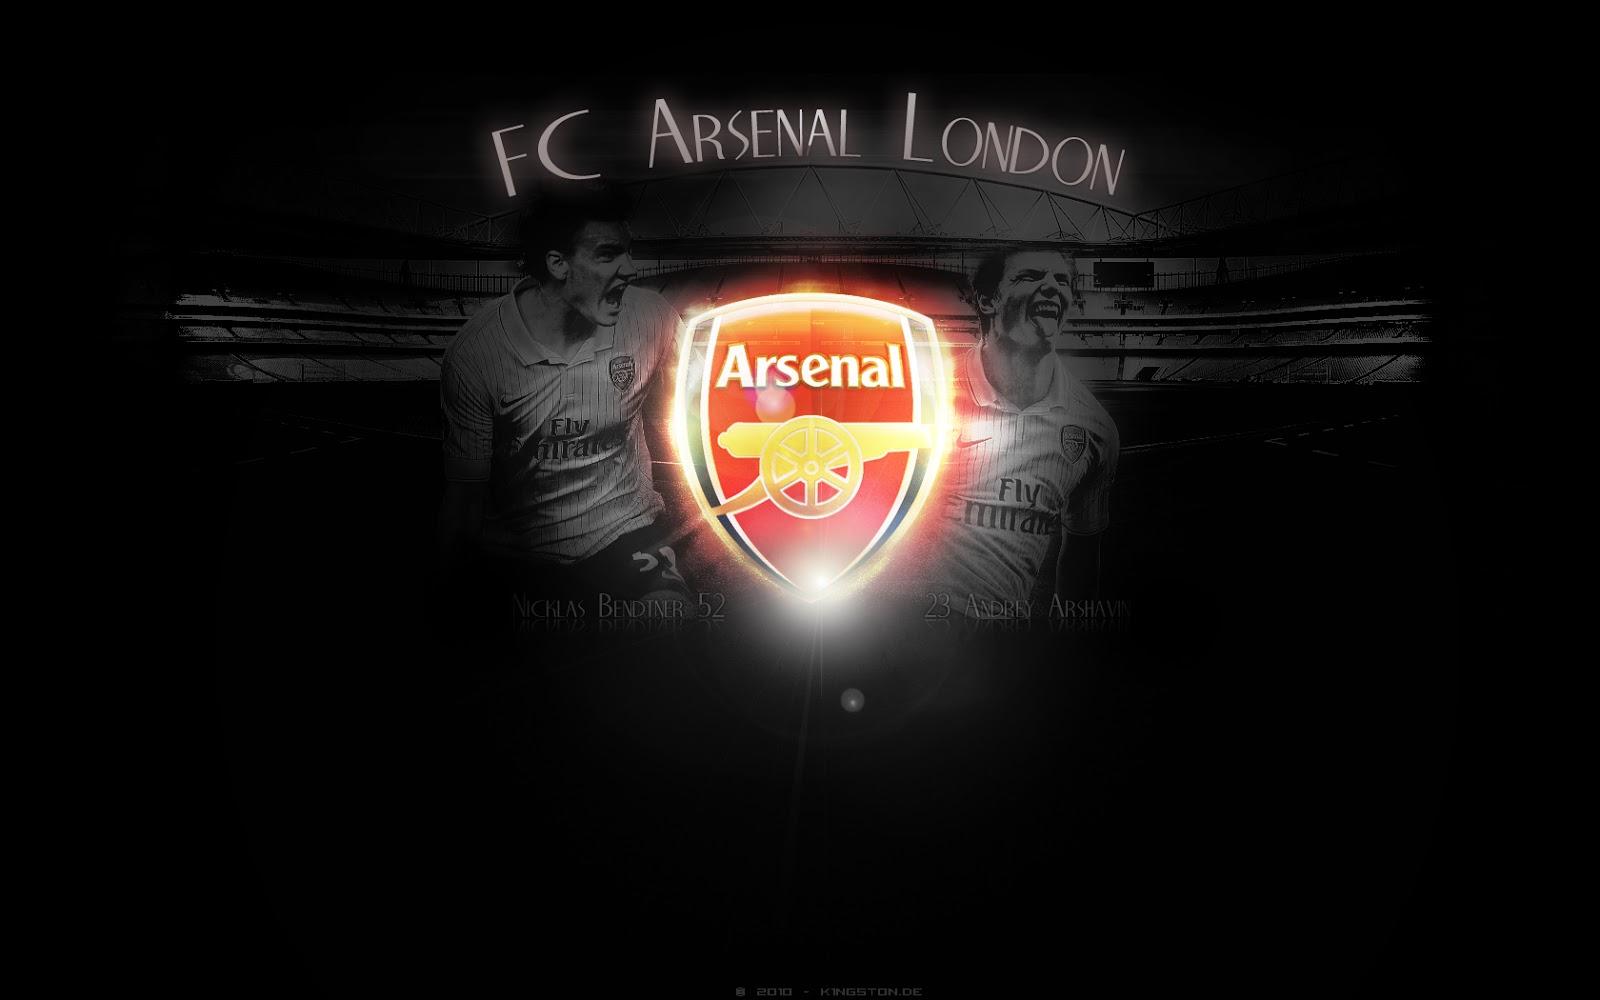 Arsenal Fc 3d Wallpapers Wallpapers Hd For Mac Arsenal Logo Wallpaper 2013